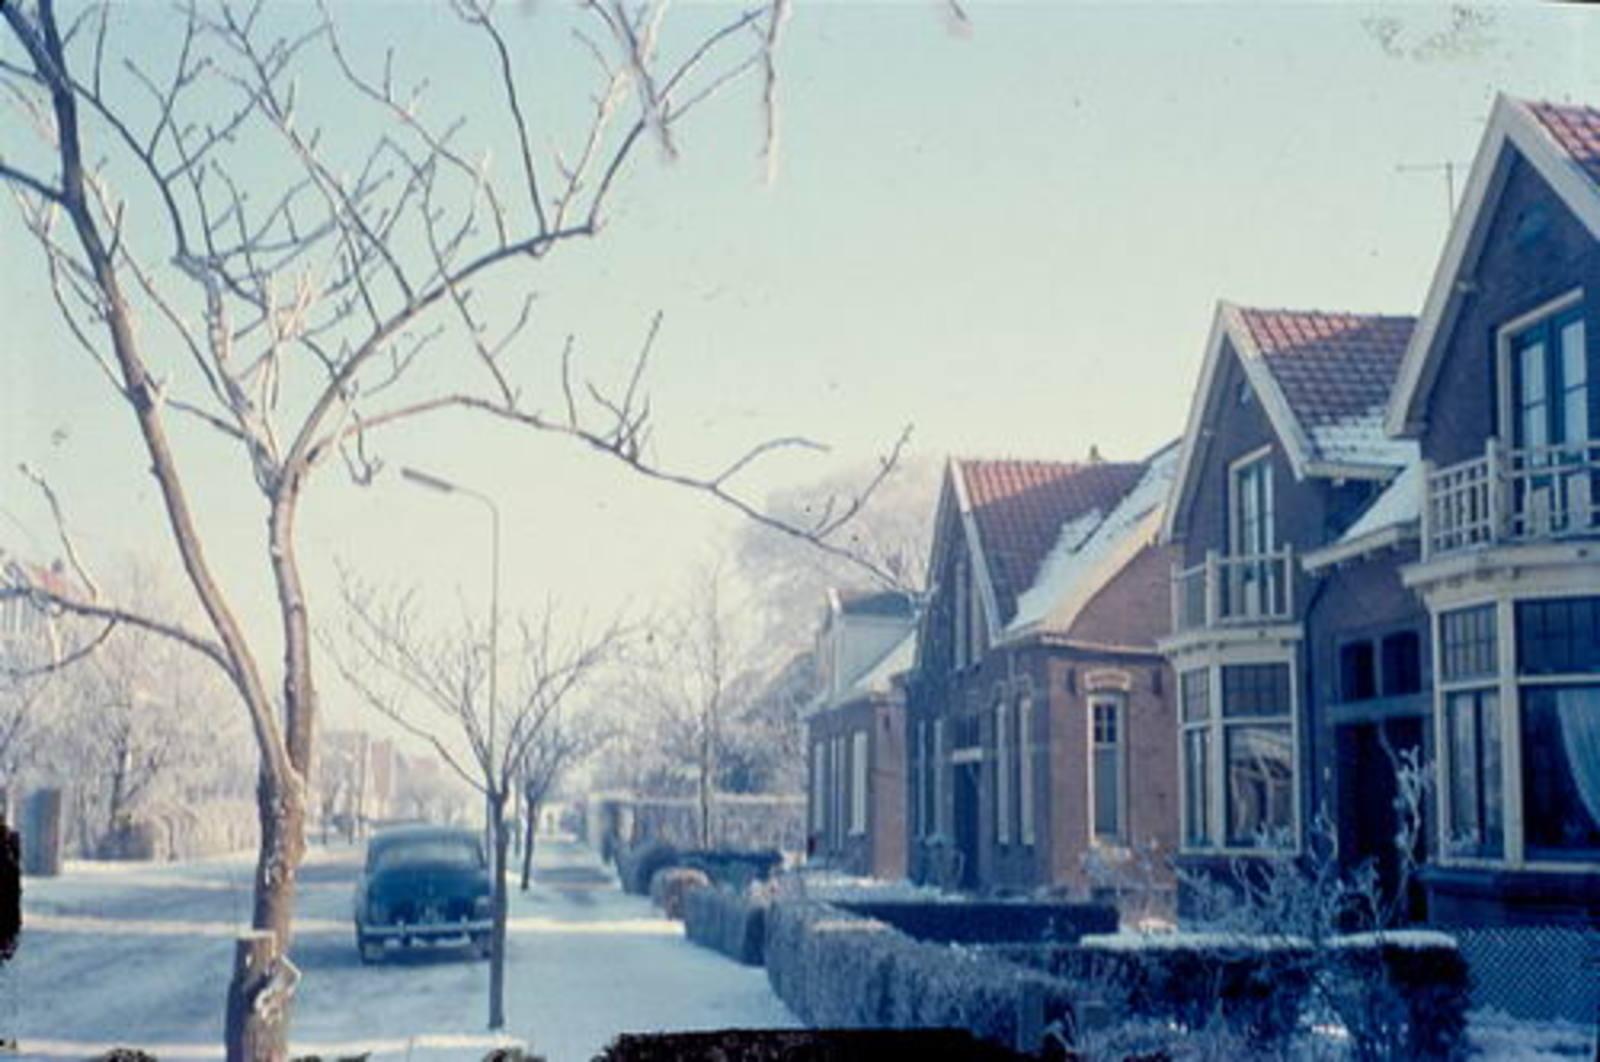 Nieuweweg O 0056- 1962± Huize Kemp ea in de Sneeuw